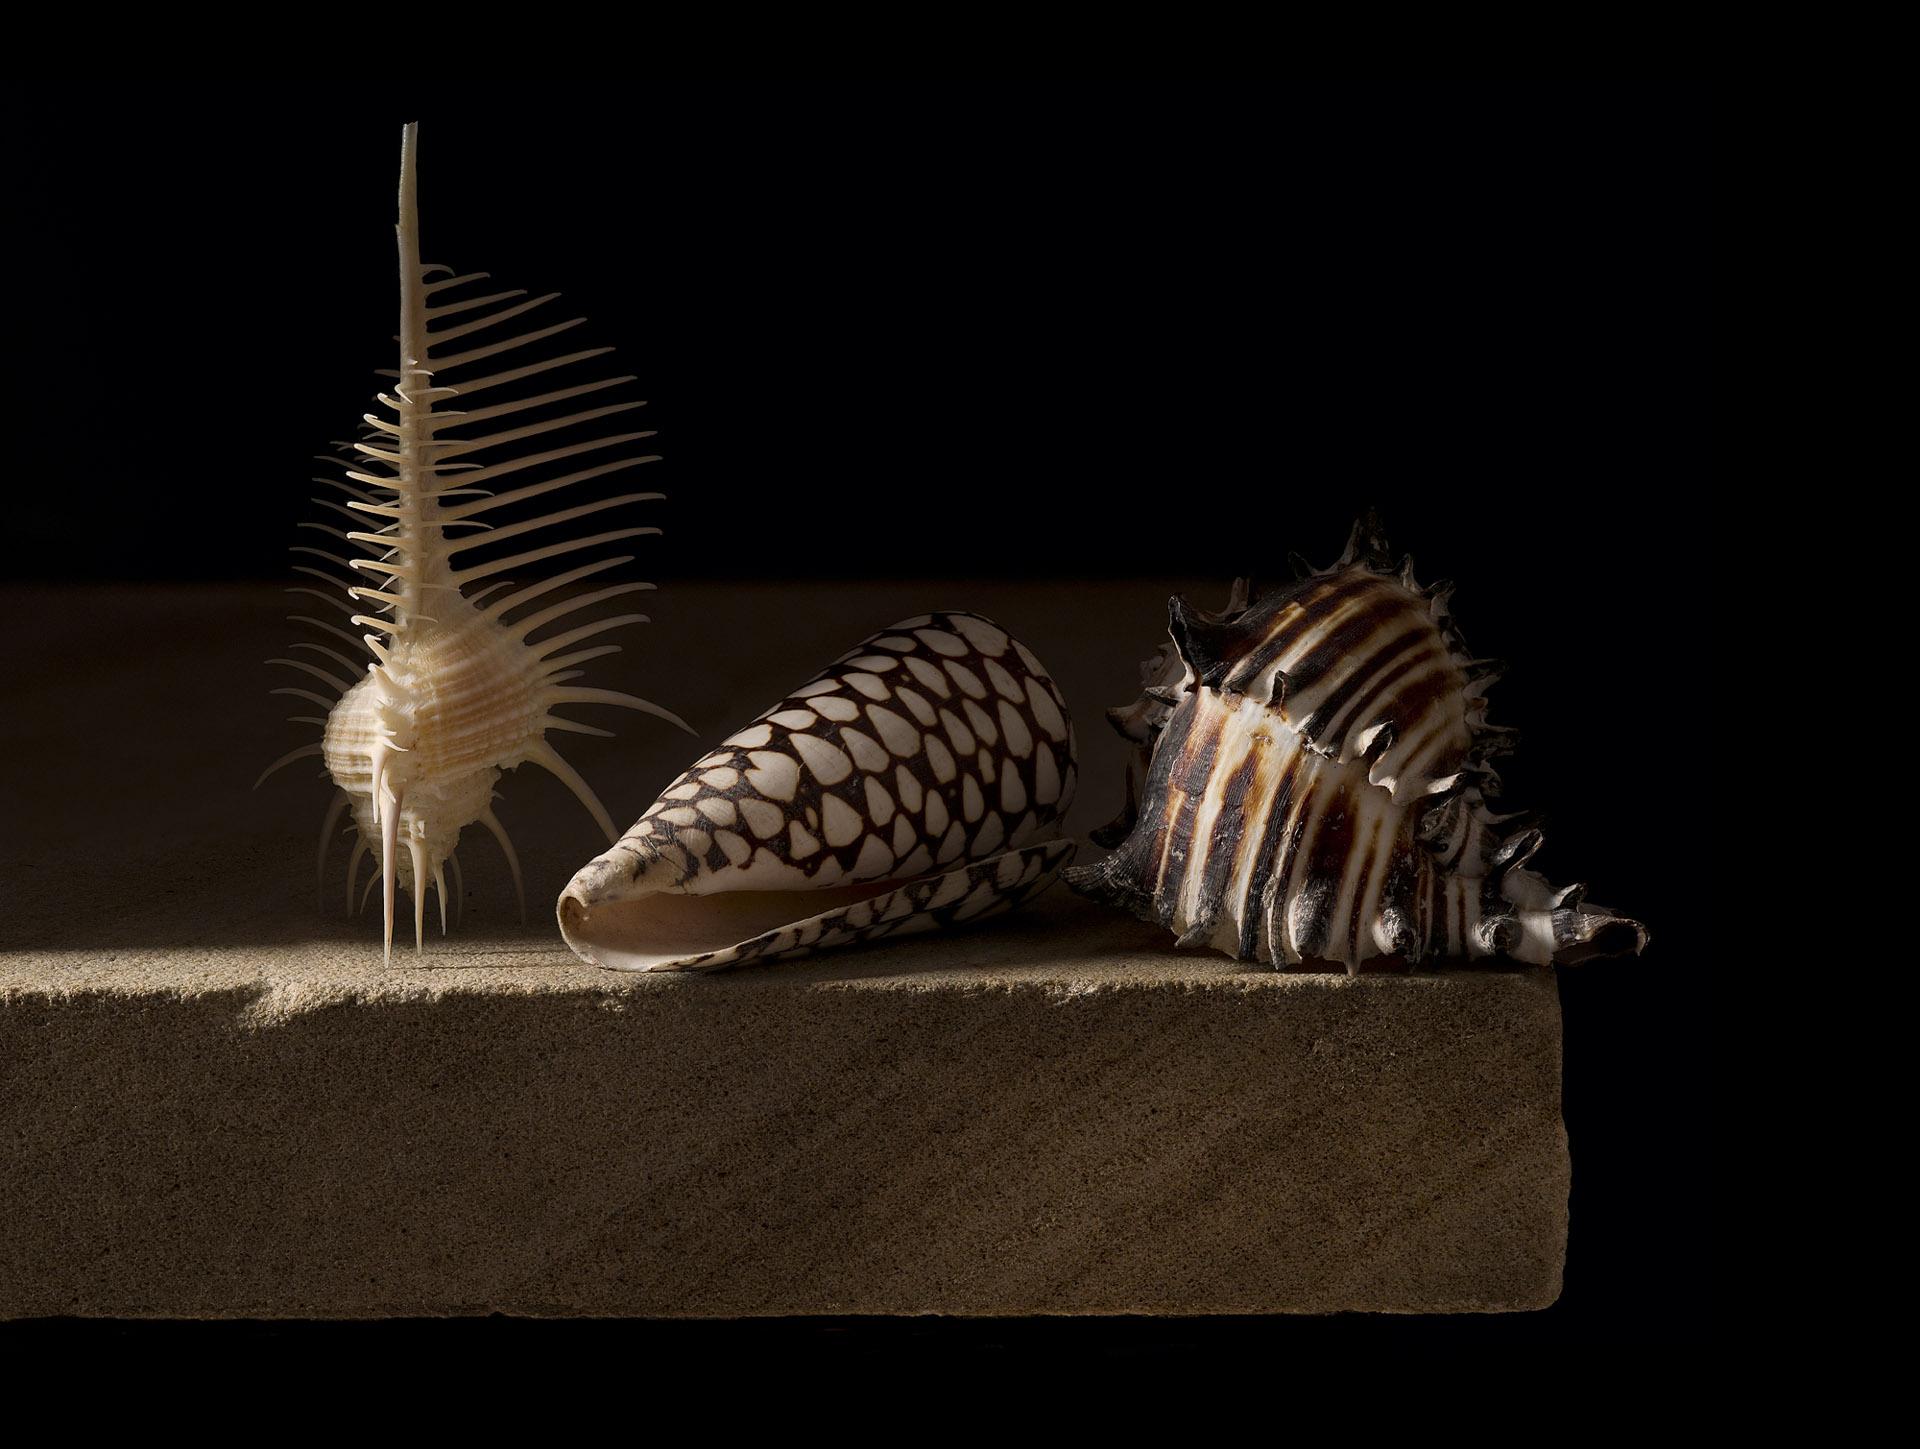 Still life with three shells